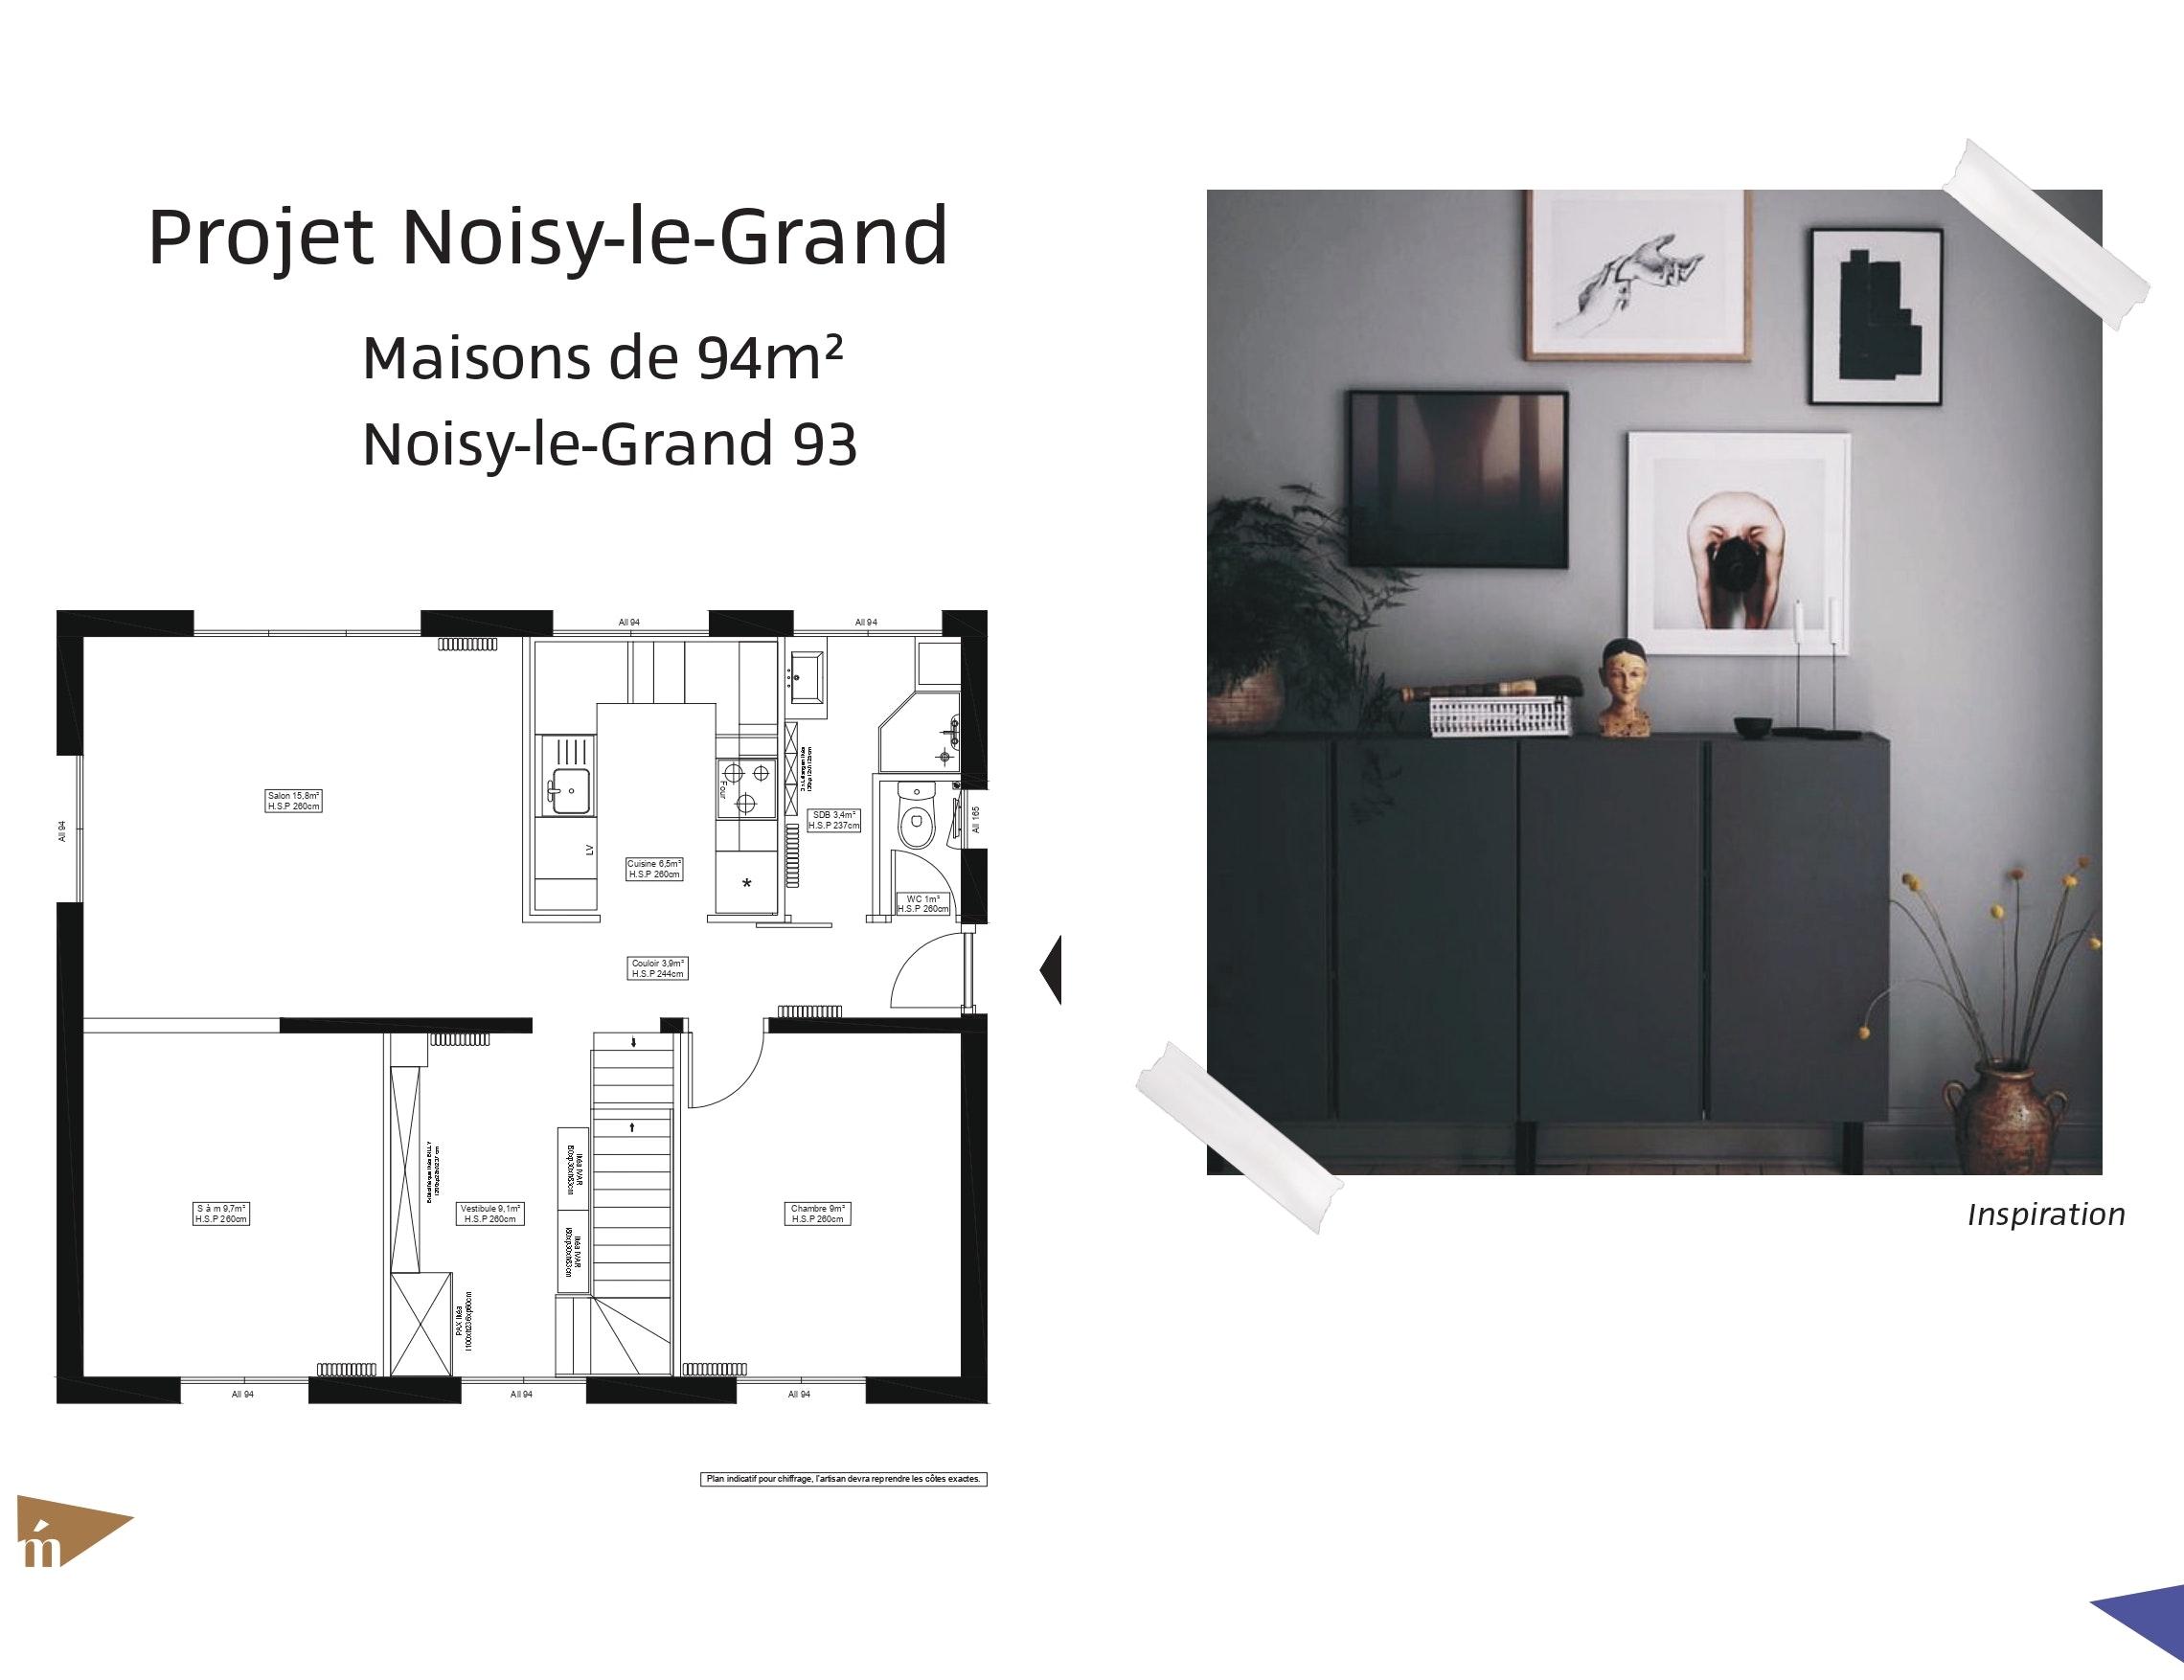 photo Projet Noisy-le-Grand - 94m² Léa Mast - Architecte hemea